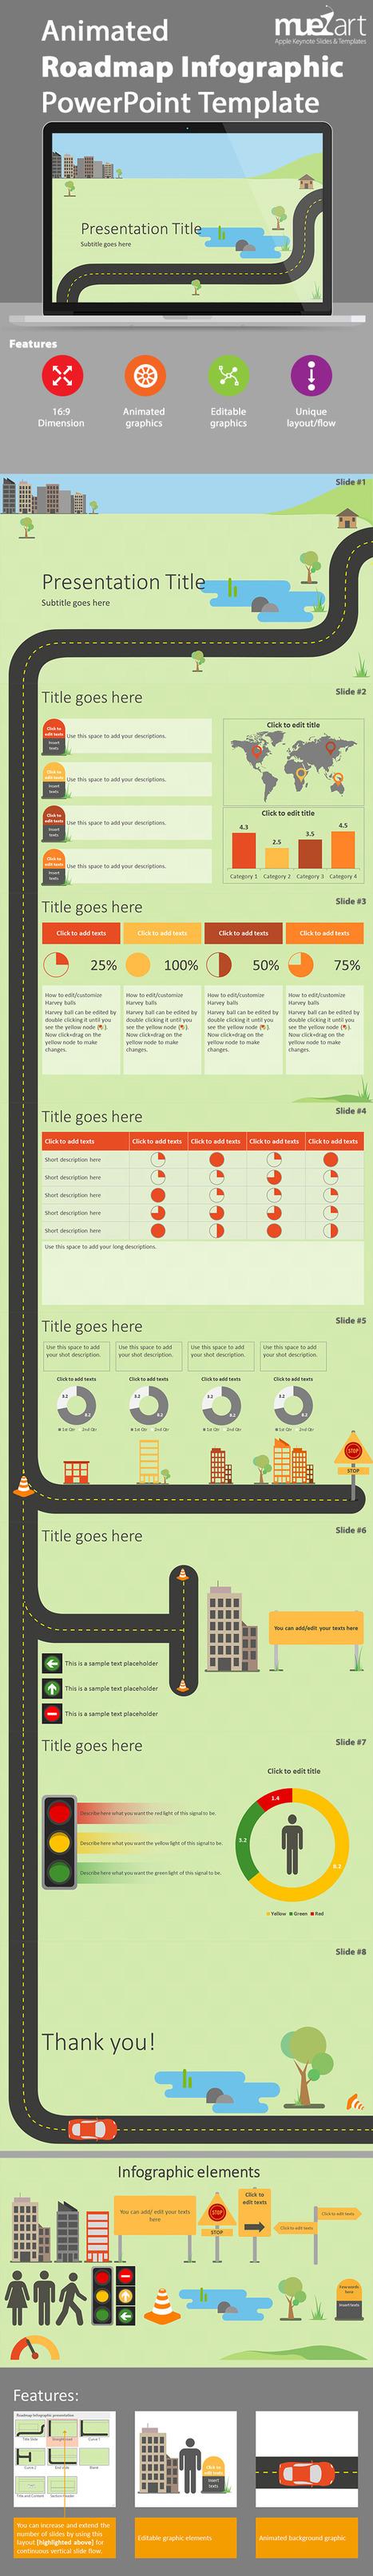 Infographic Roadmap Template   Apple Keynote Slides For Sale   Scoop.it